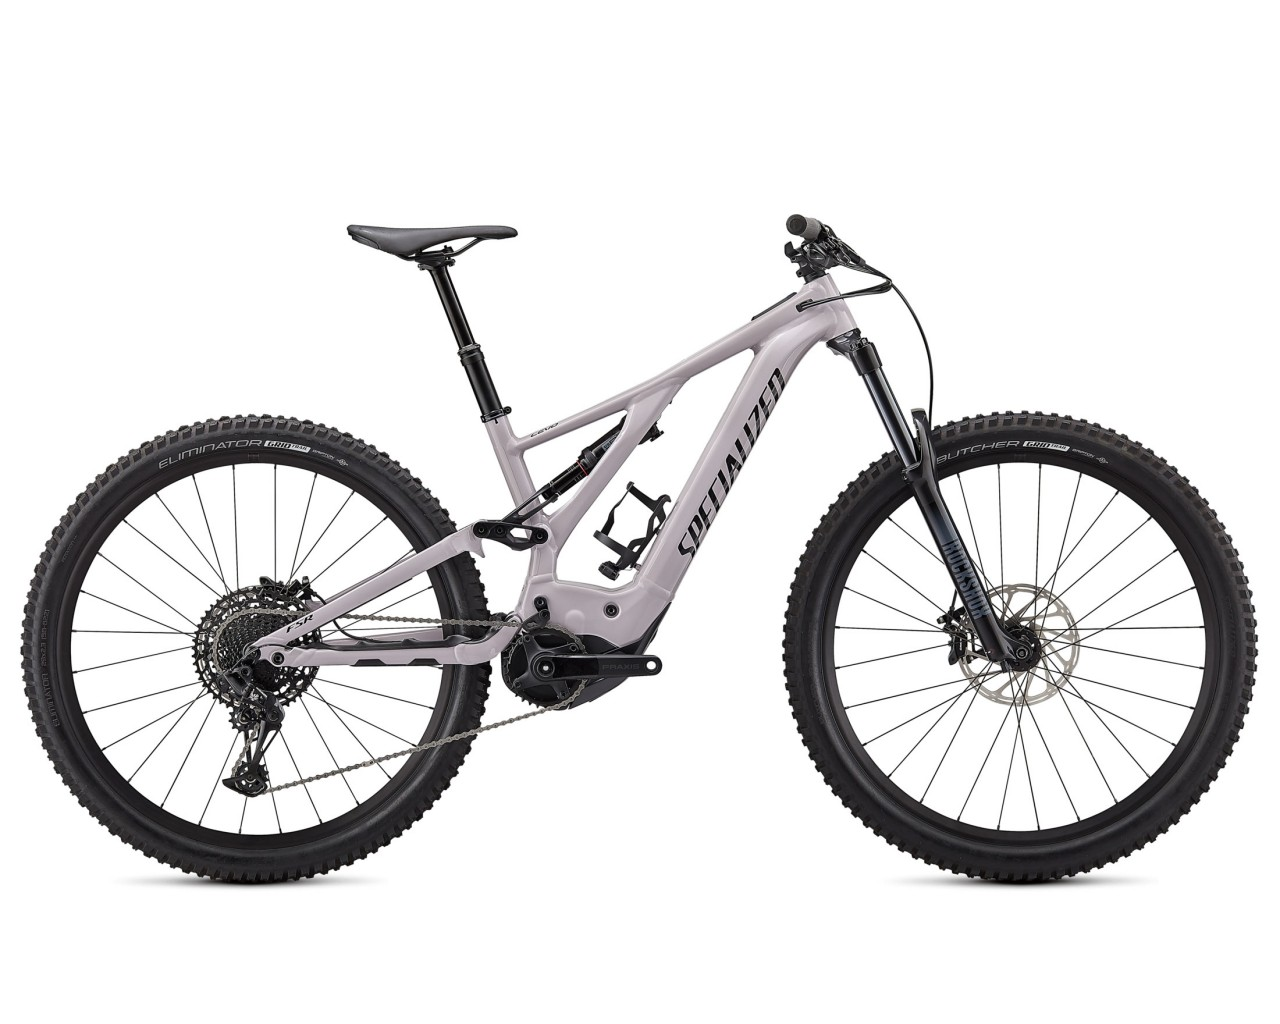 Specialized Levo 29 - Pedelec Mountain Bike Fullsuspension 2021 | clay-black-flake silver